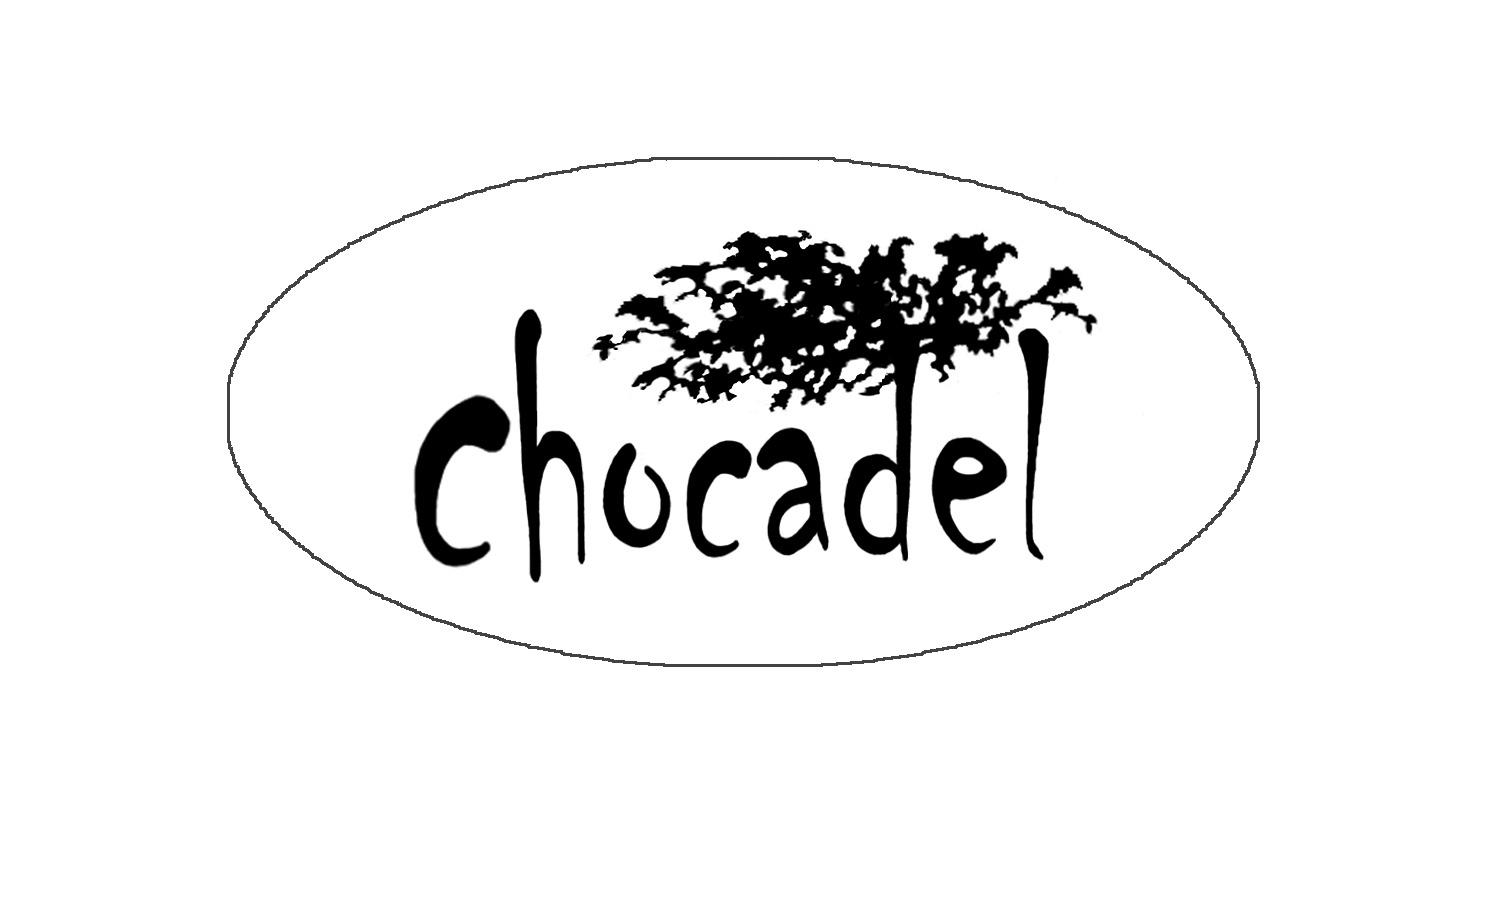 Chocadel